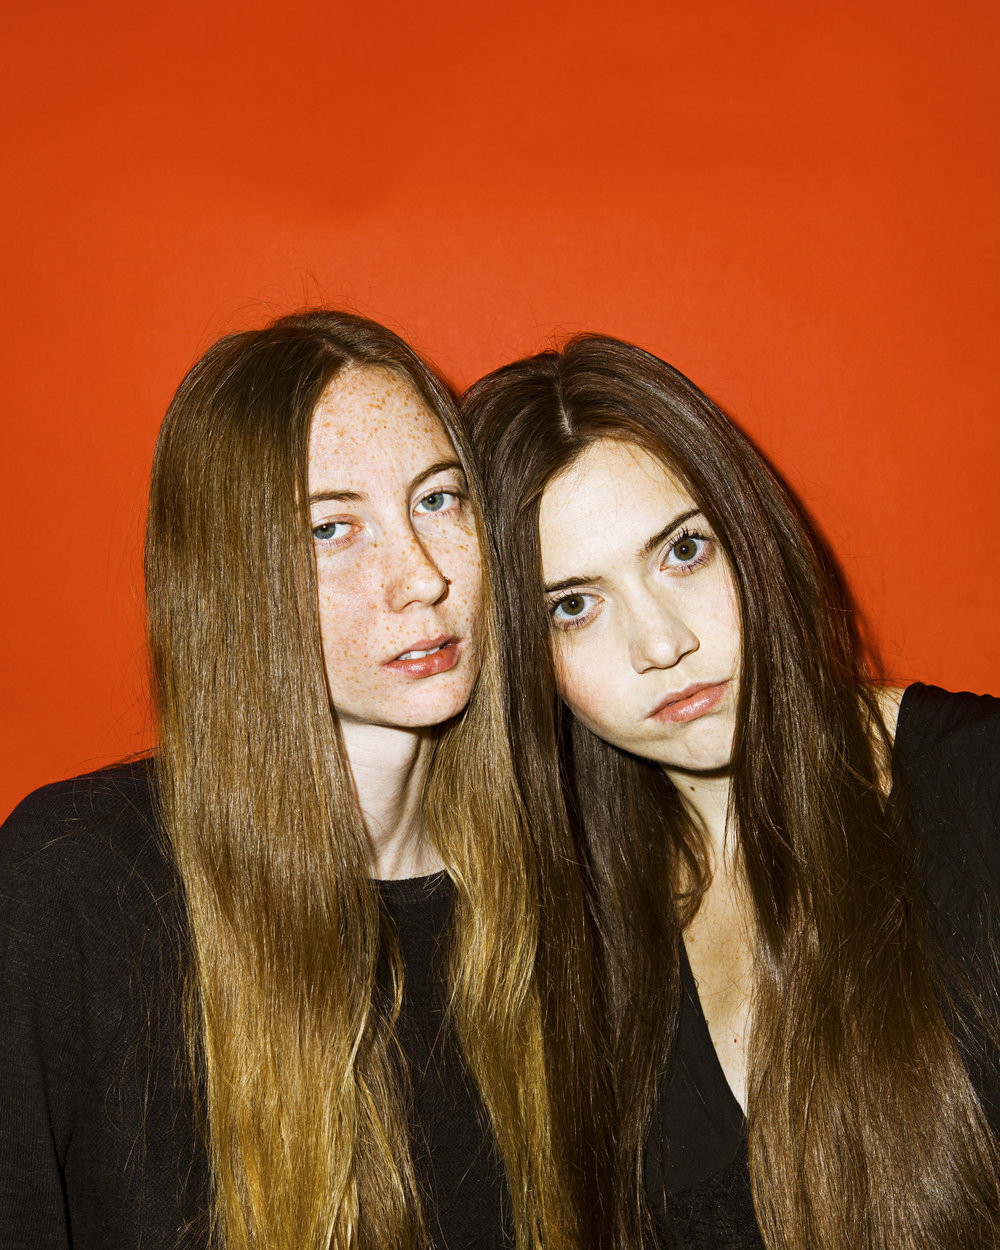 Janine + Alyssa